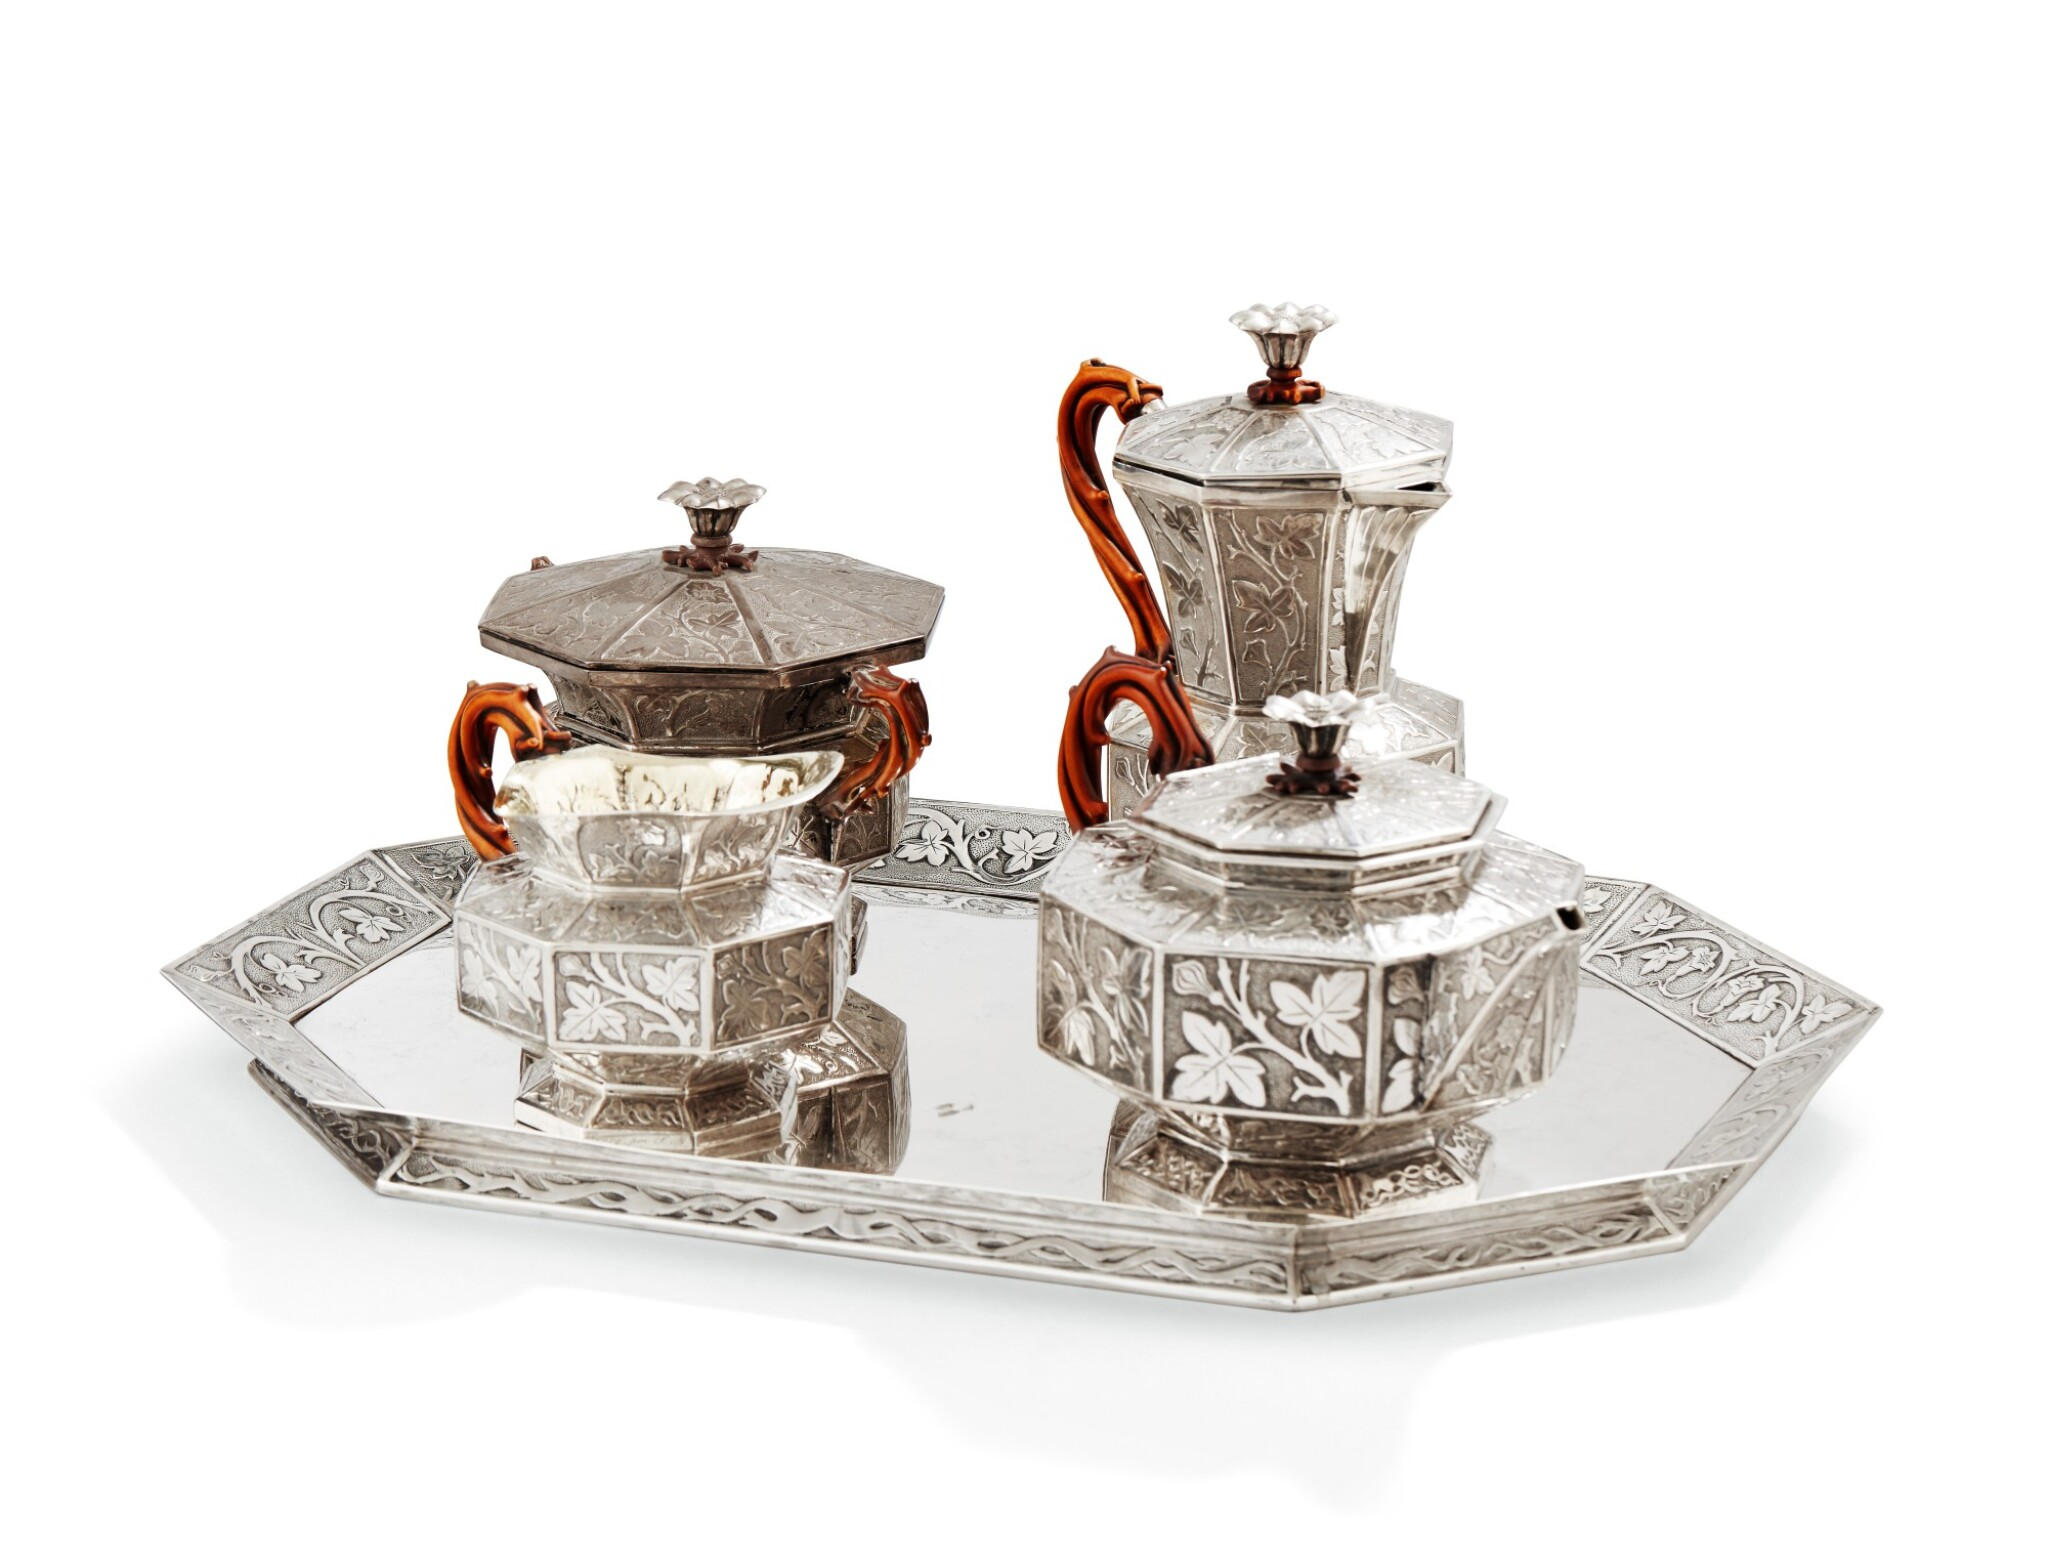 View full screen - View 1 of Lot 126. A SILVER TEA AND COFFEE SET, GIFT FROM EMPRESS OF RUSSIA, WEISSHAUPT, MUNICH, 1839   CADEAU DE L'IMPERATRICE ALEXANDRA FEODOROVNA DE RUSSIE SERVICE À THÉ ET CAFÉ EN ARGENT, PAR WEISSHAUPT, MUNICH, 1839.